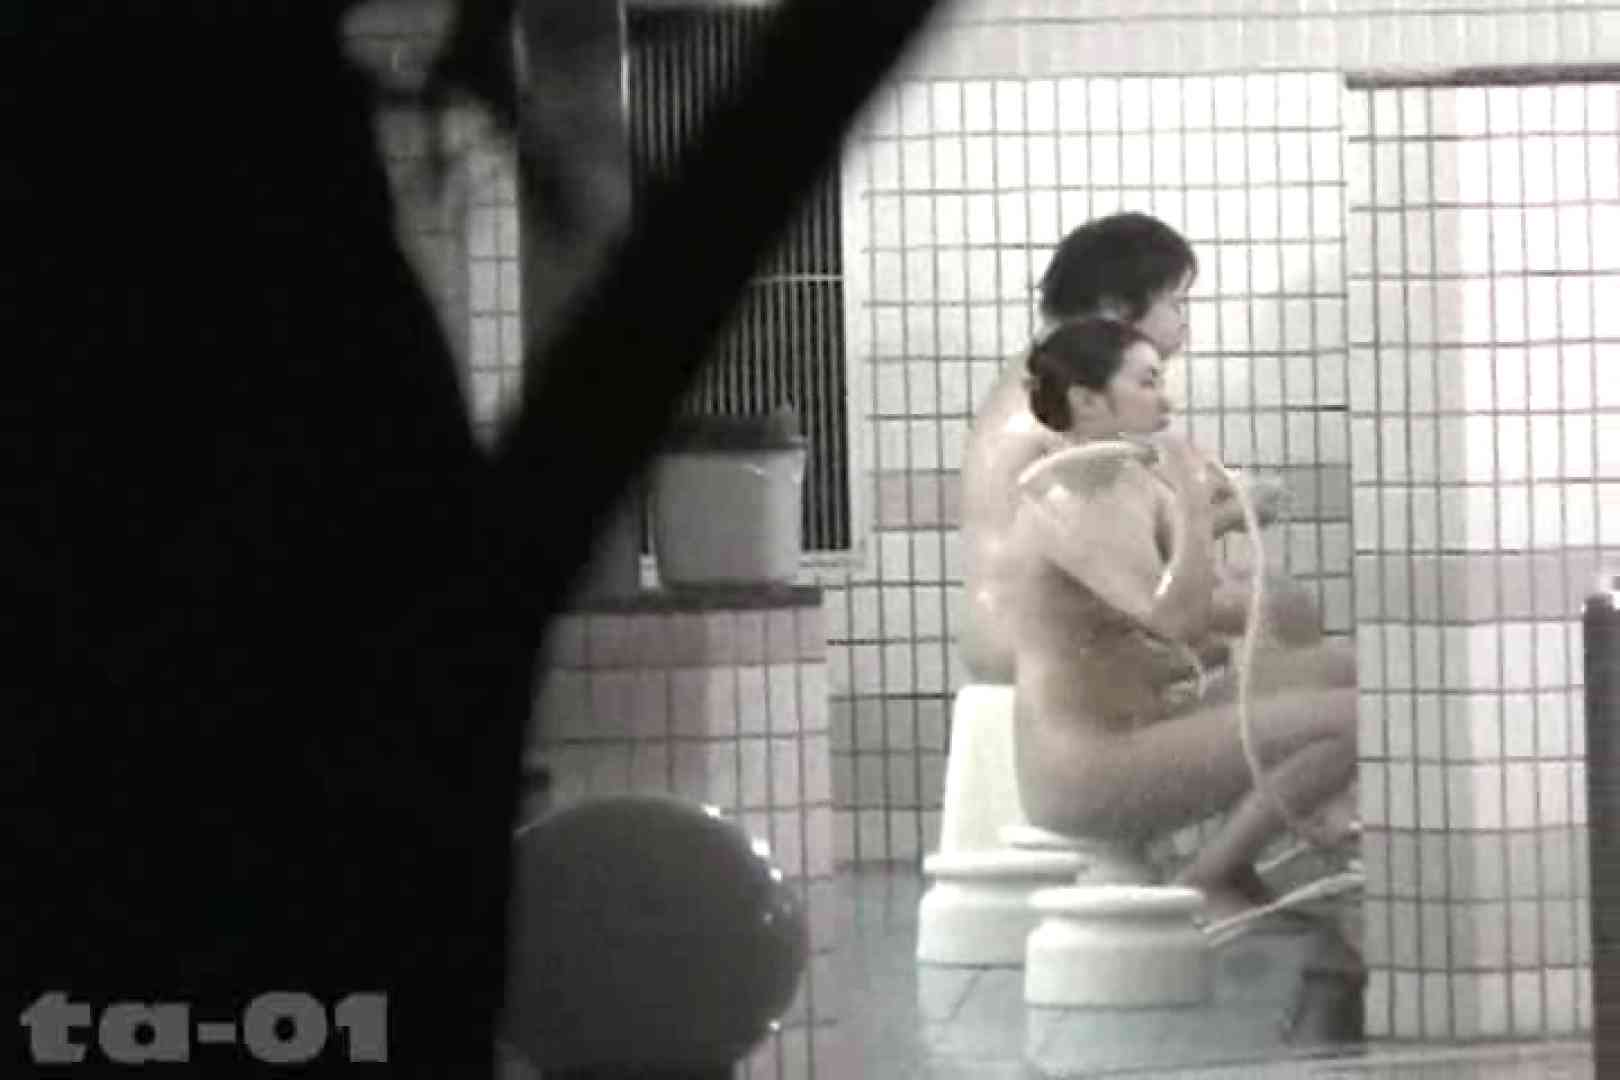 合宿ホテル女風呂盗撮高画質版 Vol.01 高画質 濡れ場動画紹介 53連発 16